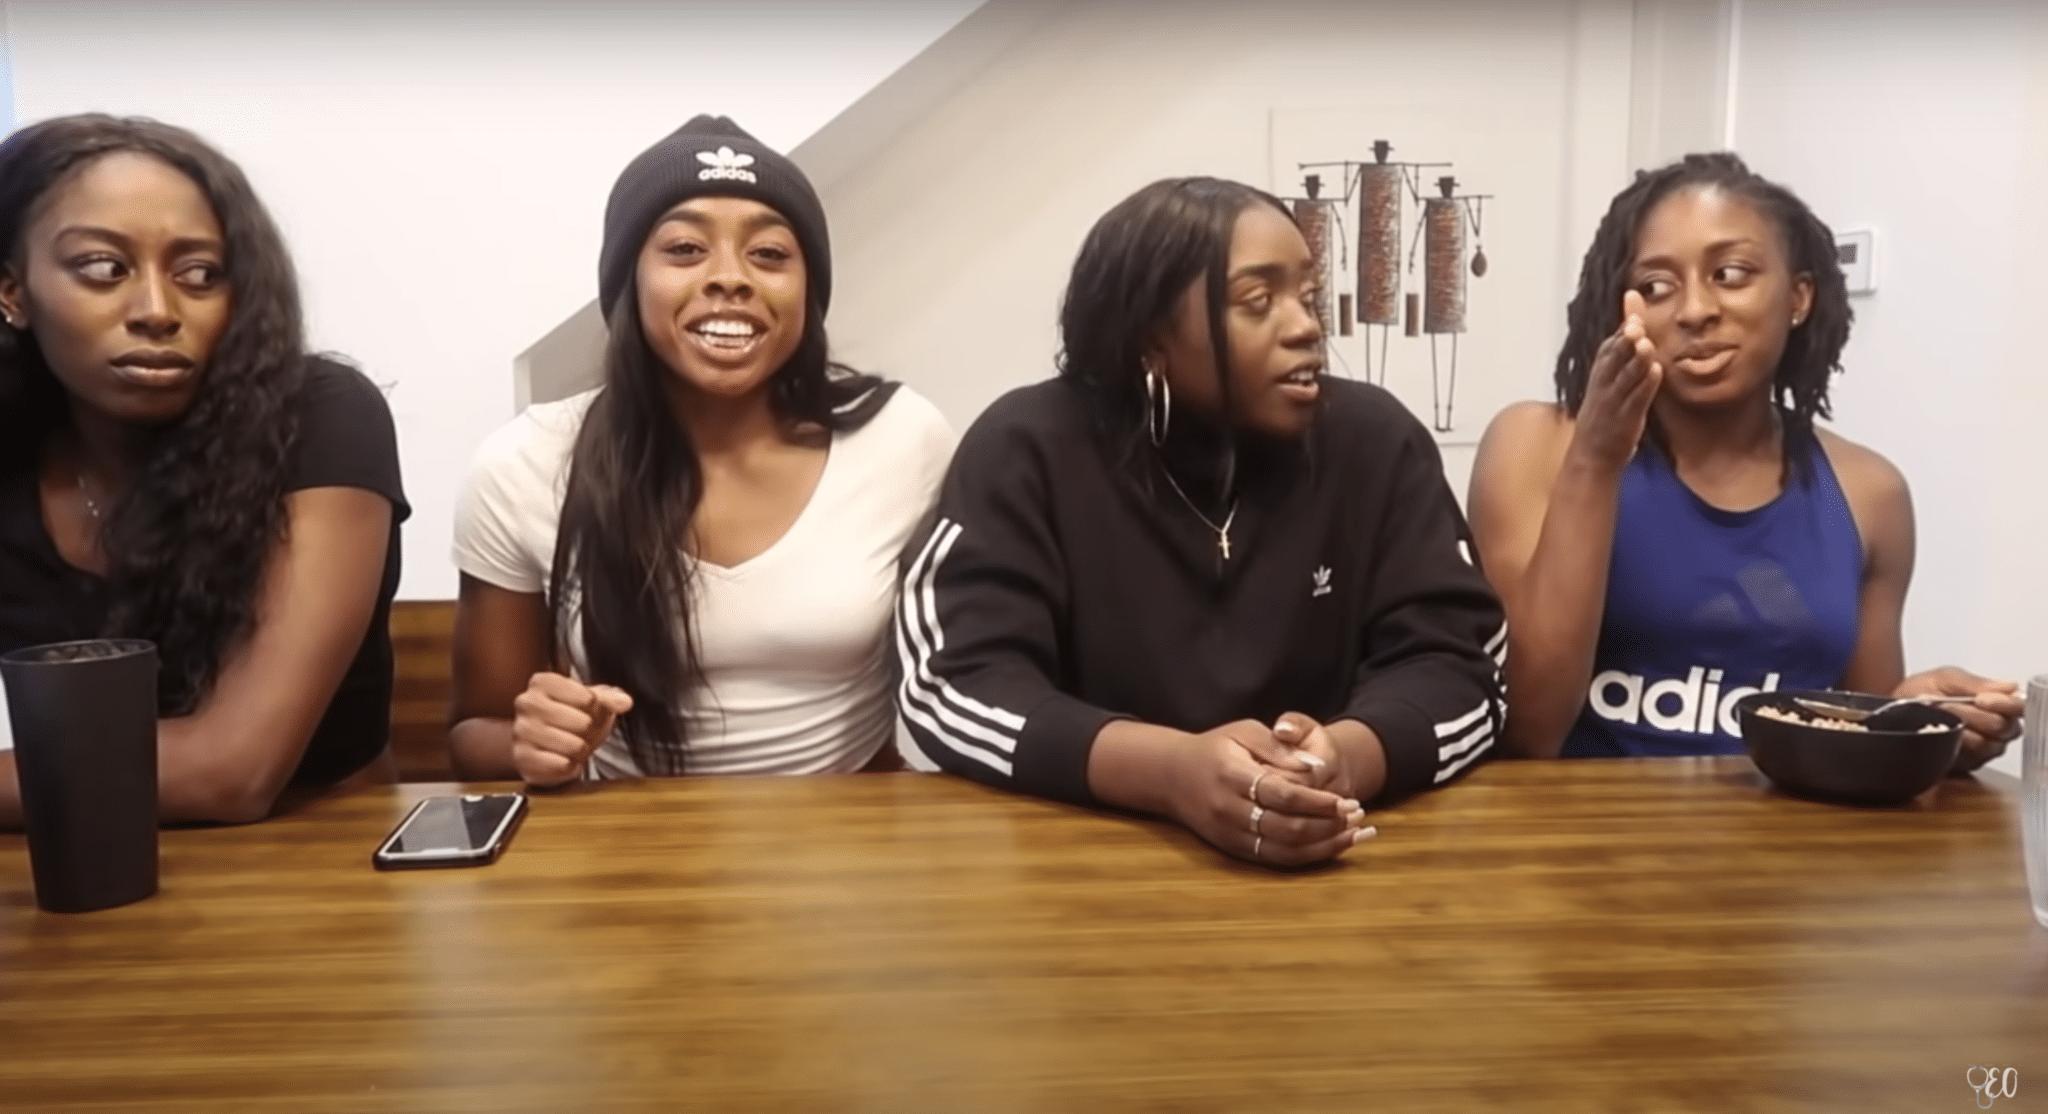 Les soeurs Ogwumike : Nneka, Chiney, Olivia et Erica